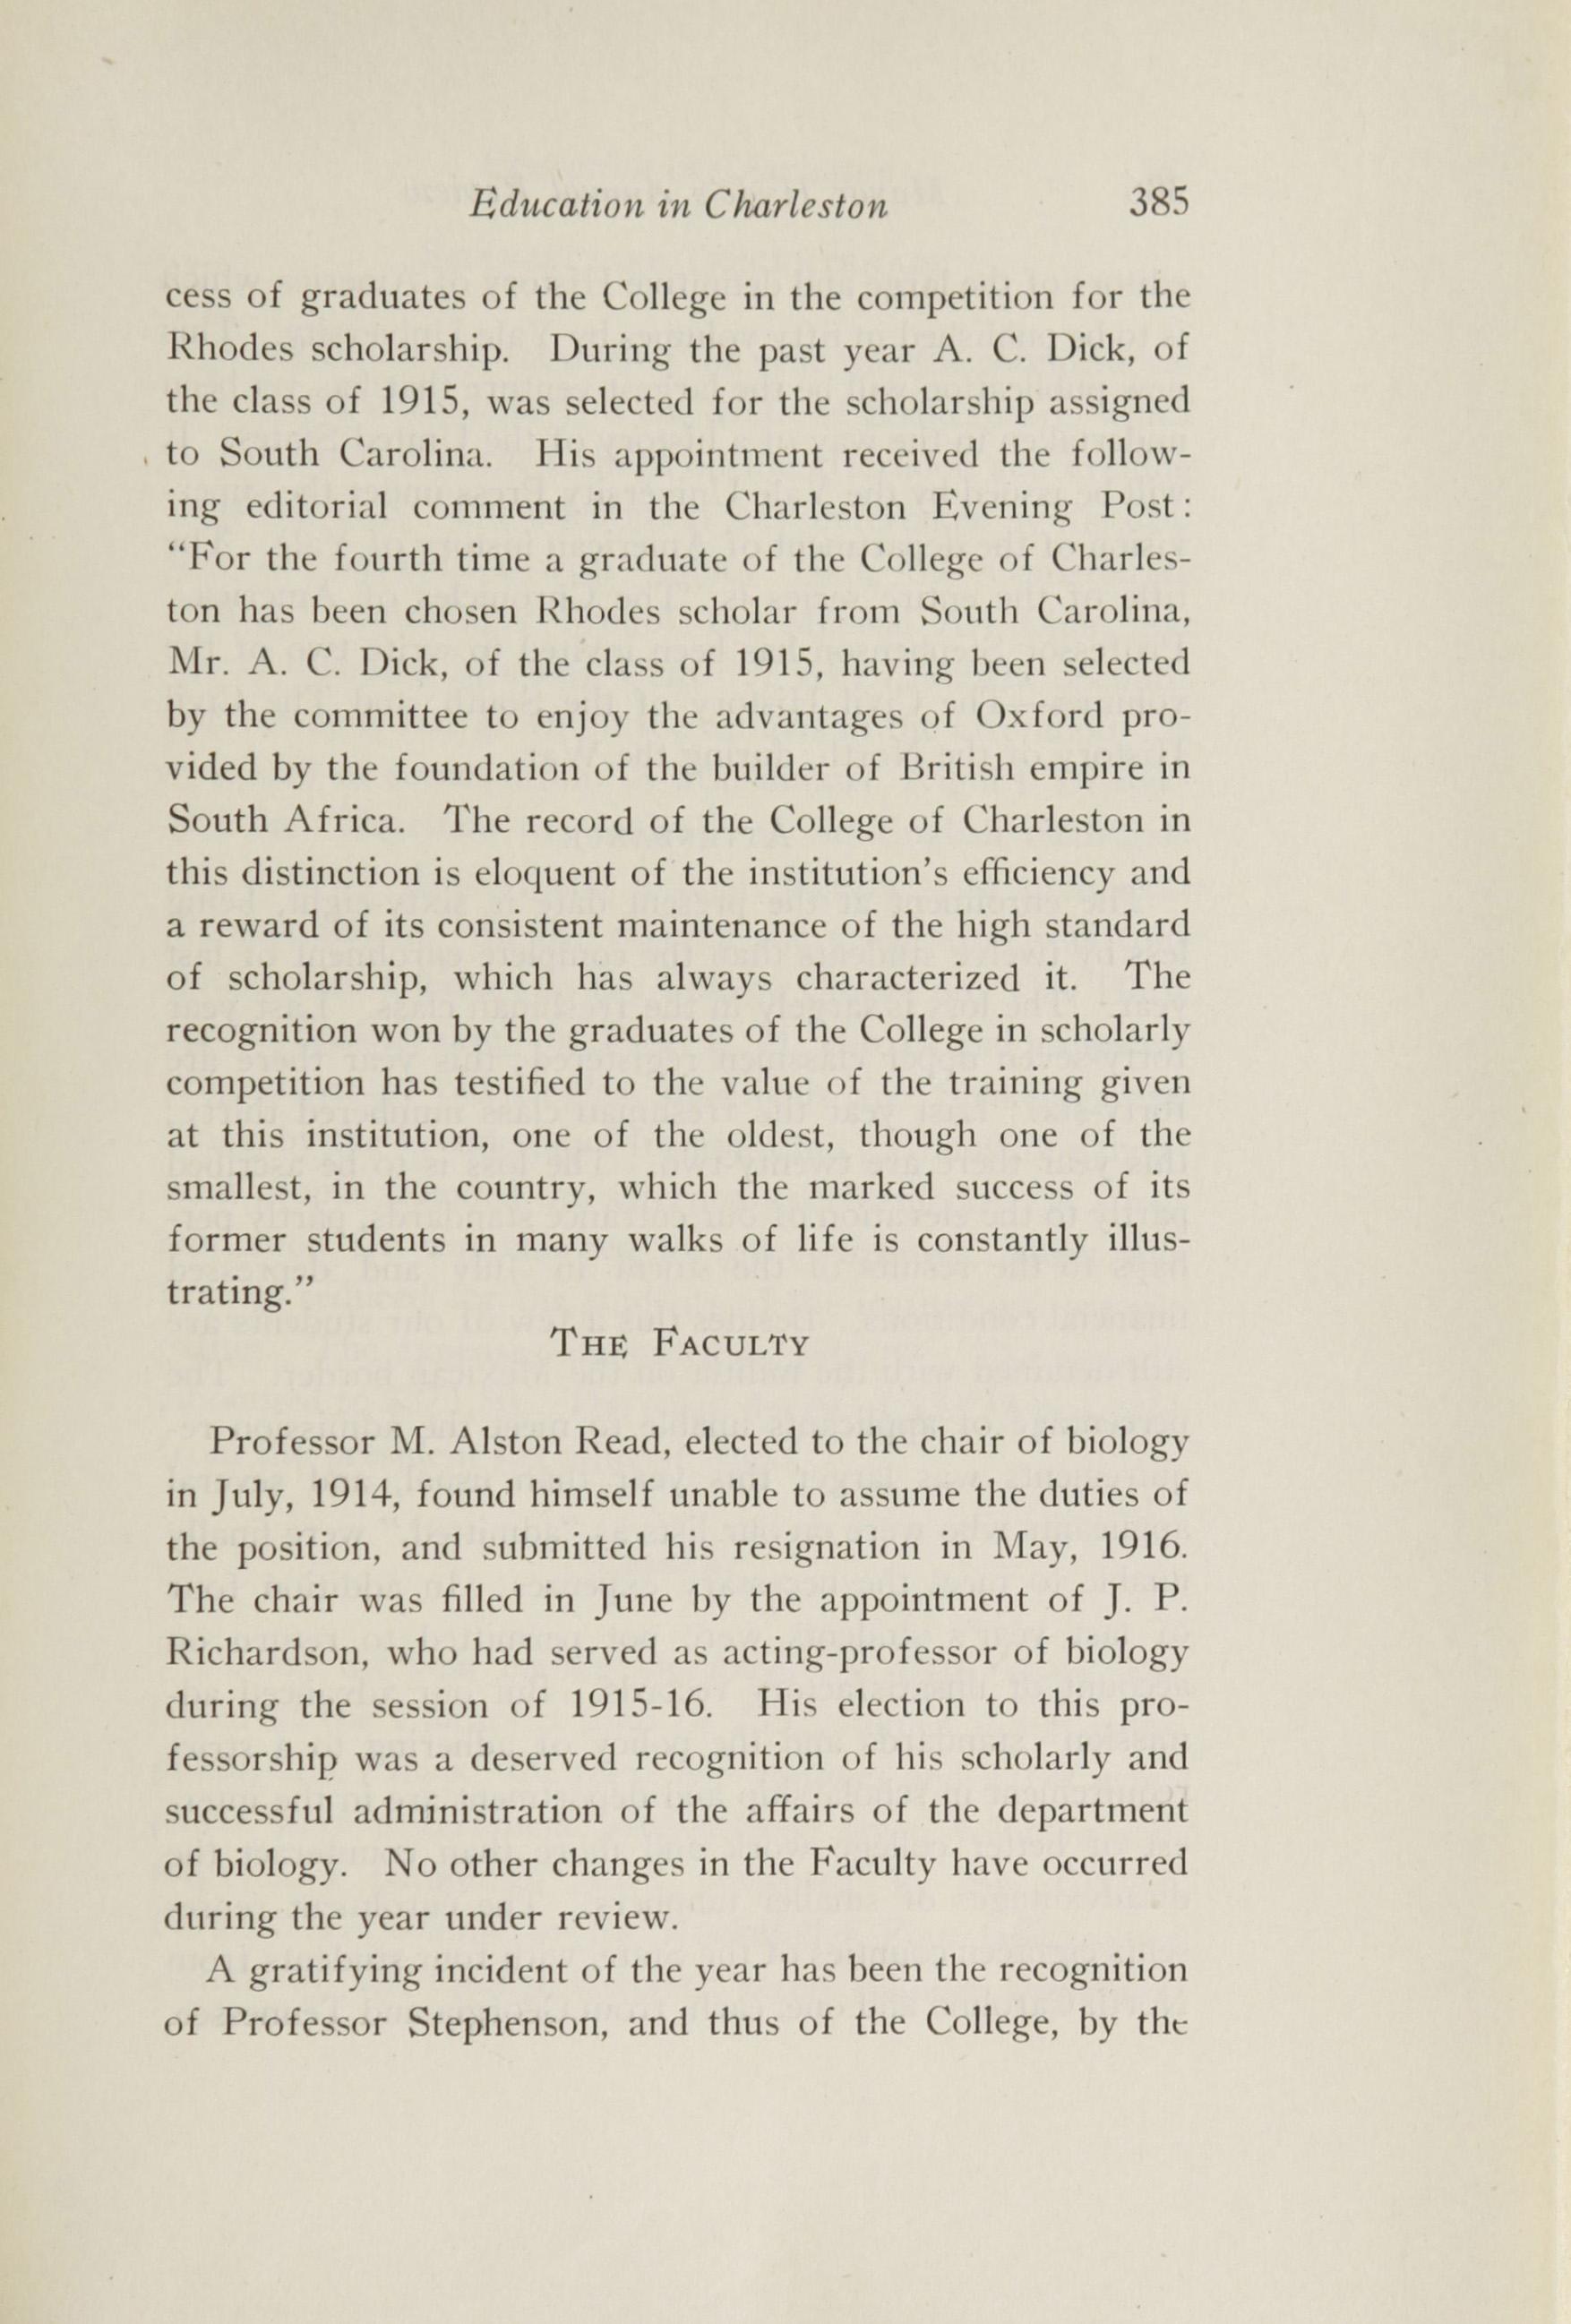 Charleston Yearbook, 1916, page 385